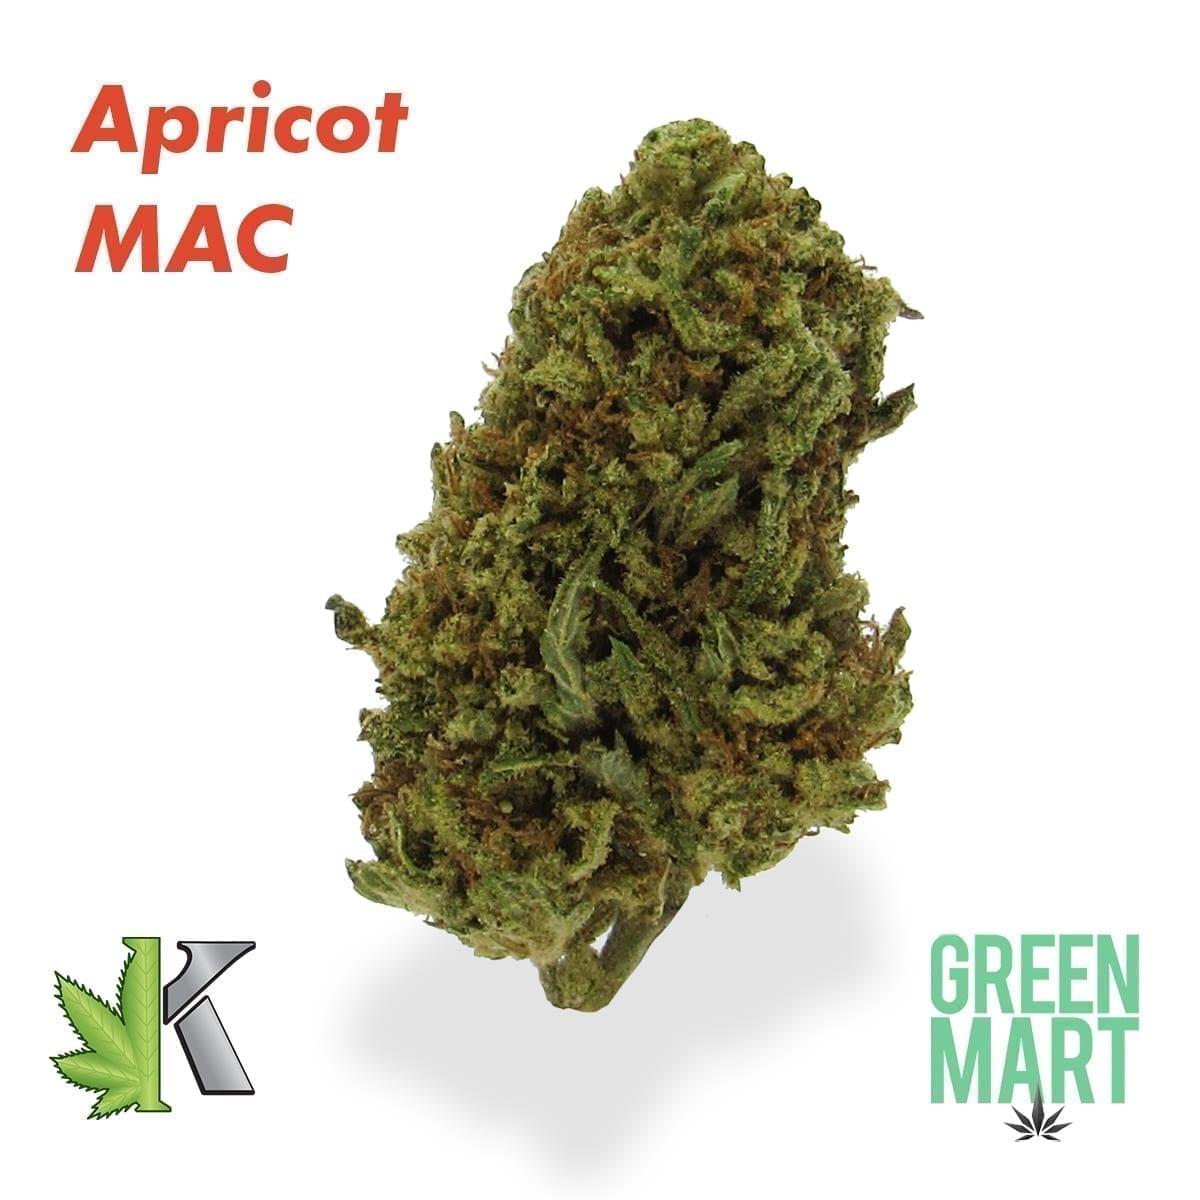 Apricot MAC